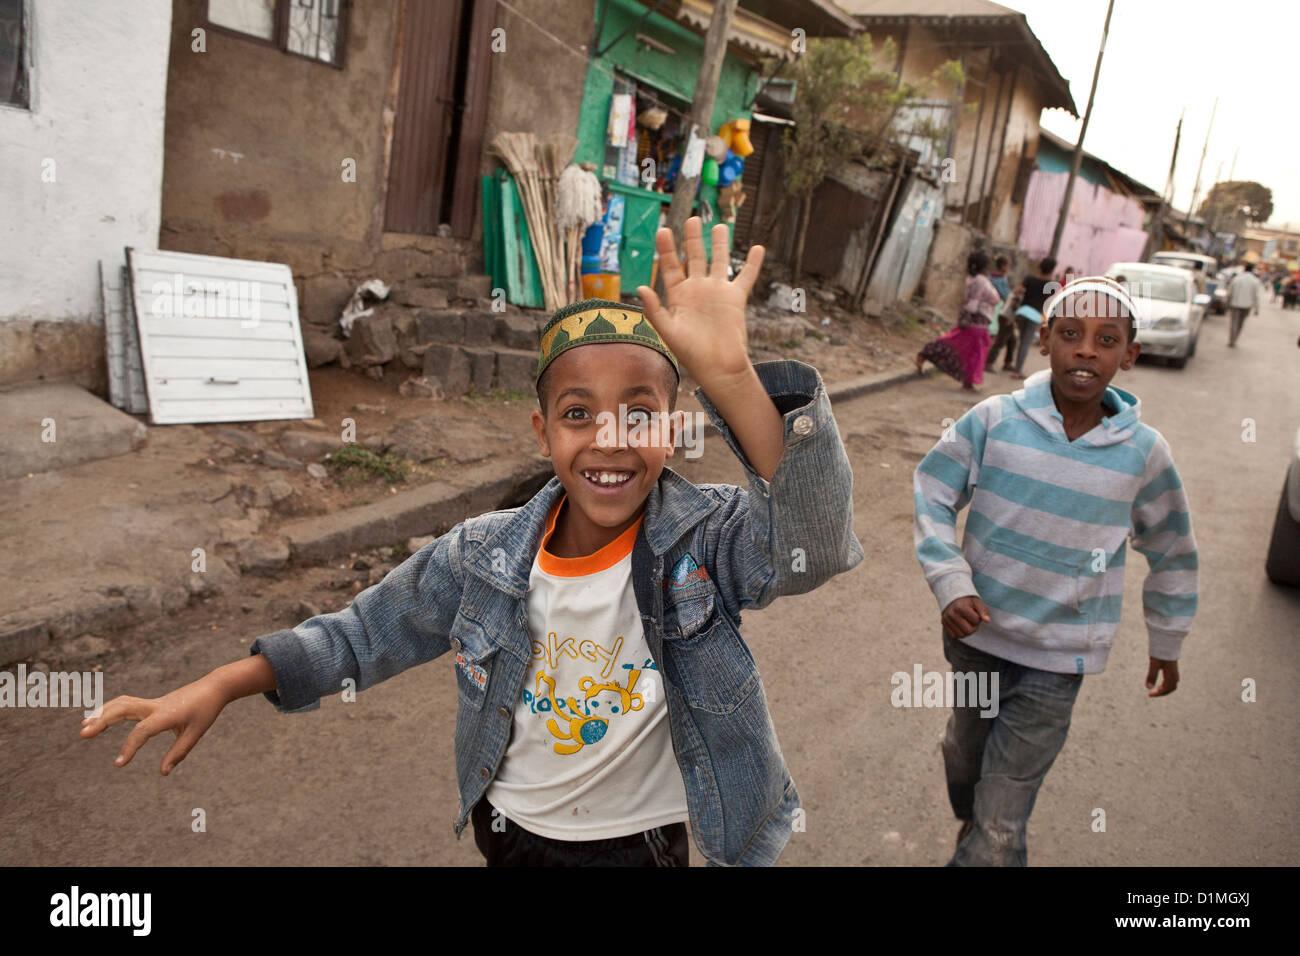 Roadside scene in Addis Ababa, Ethiopia. - Stock Image